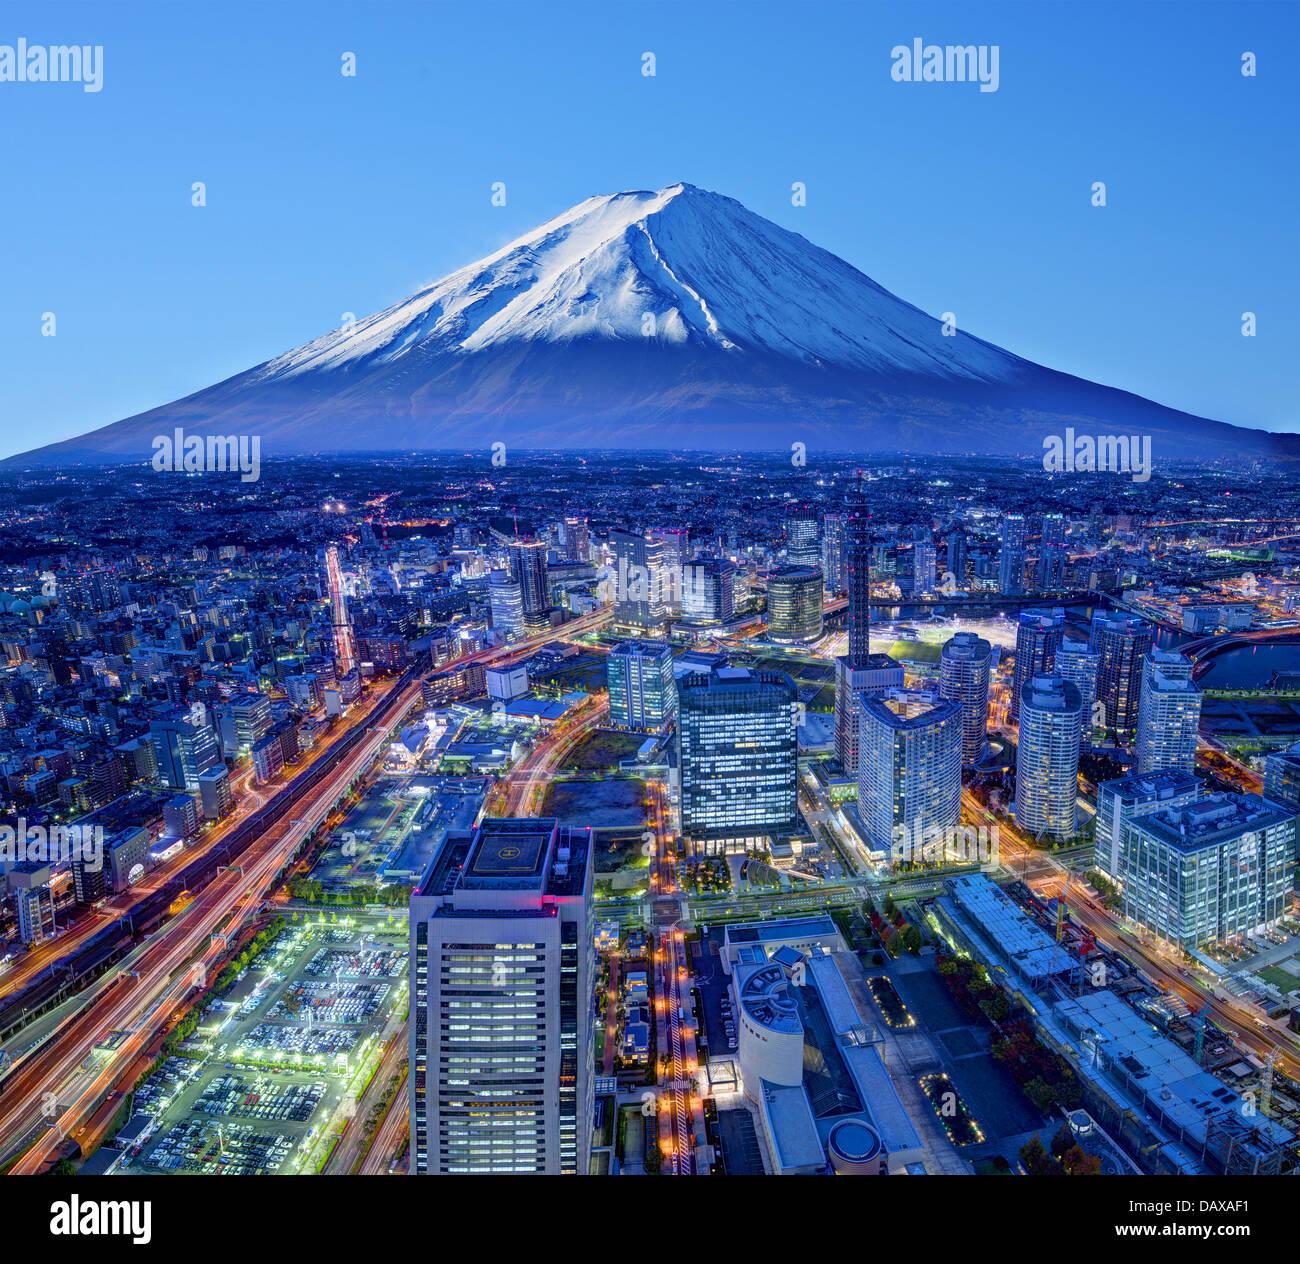 Toits de Mt. Fuji et Yokohama, Japon. Photo Stock